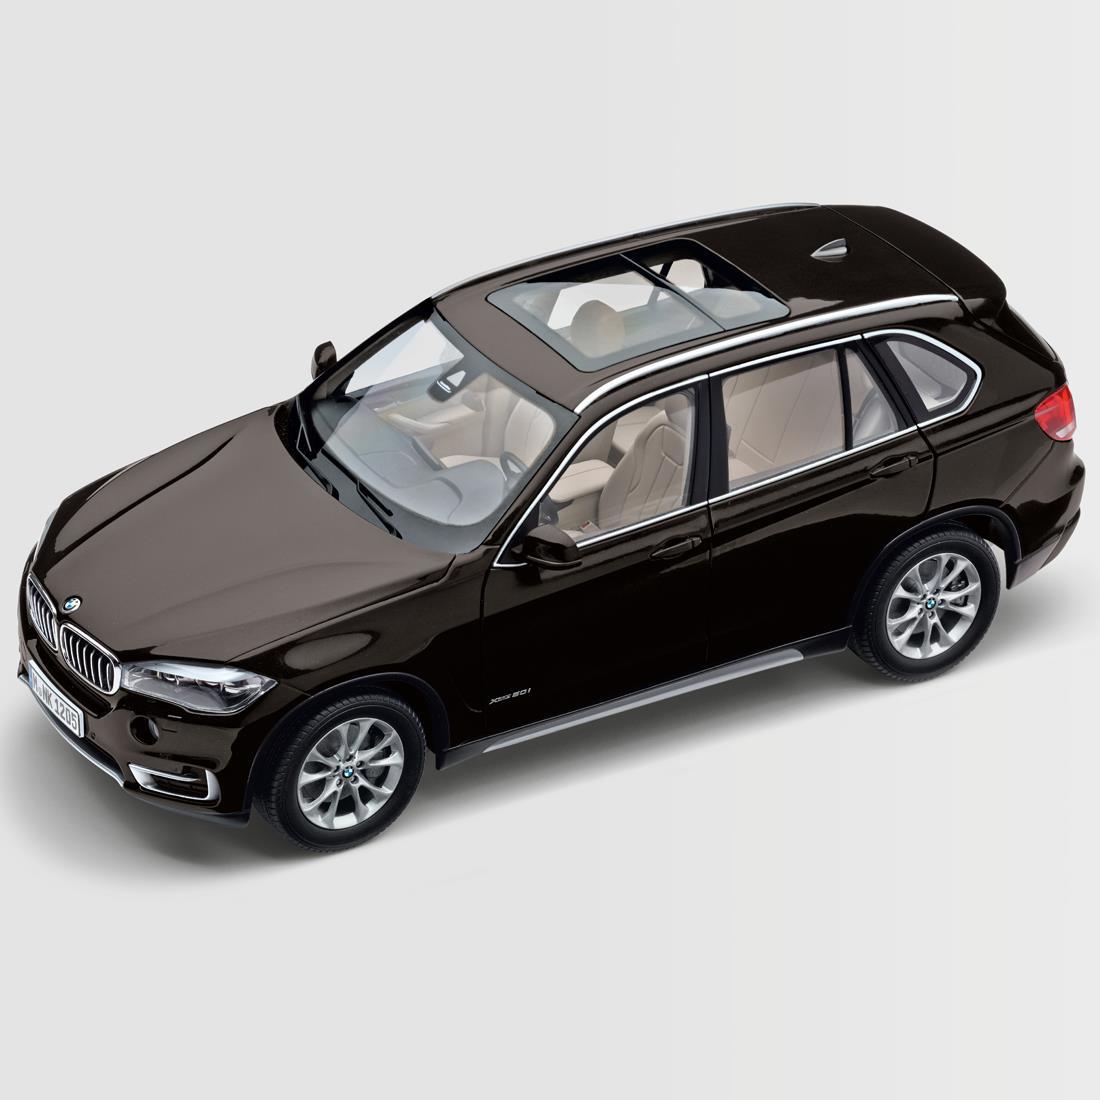 BMW X5 Model 1:43